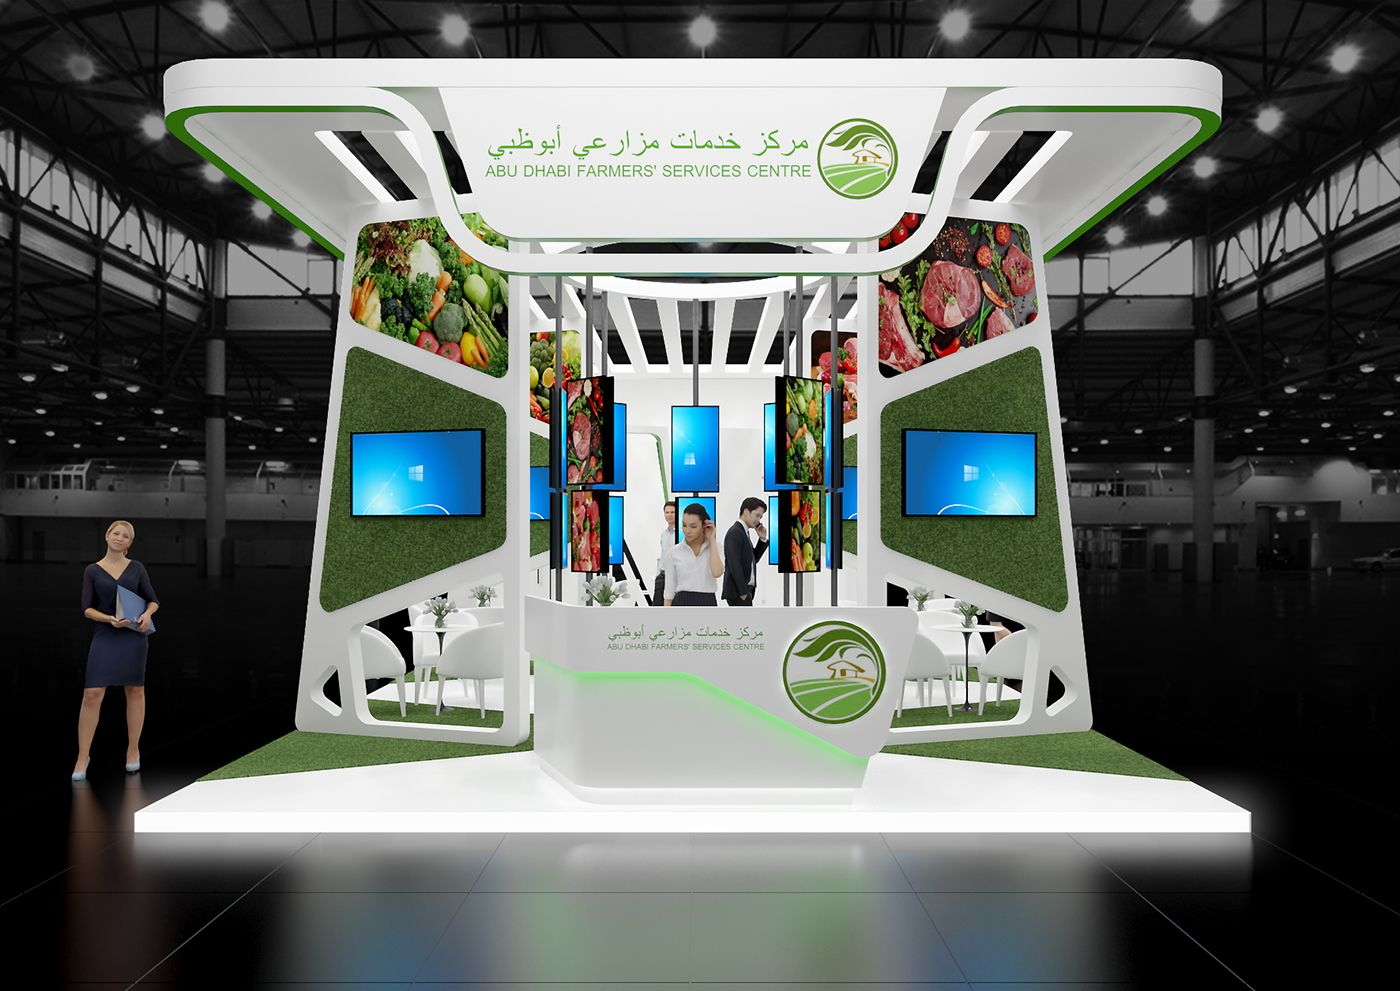 Exhibition Stand Abu Dhabi : Exhibition stand design company dubai abu dhabi uae